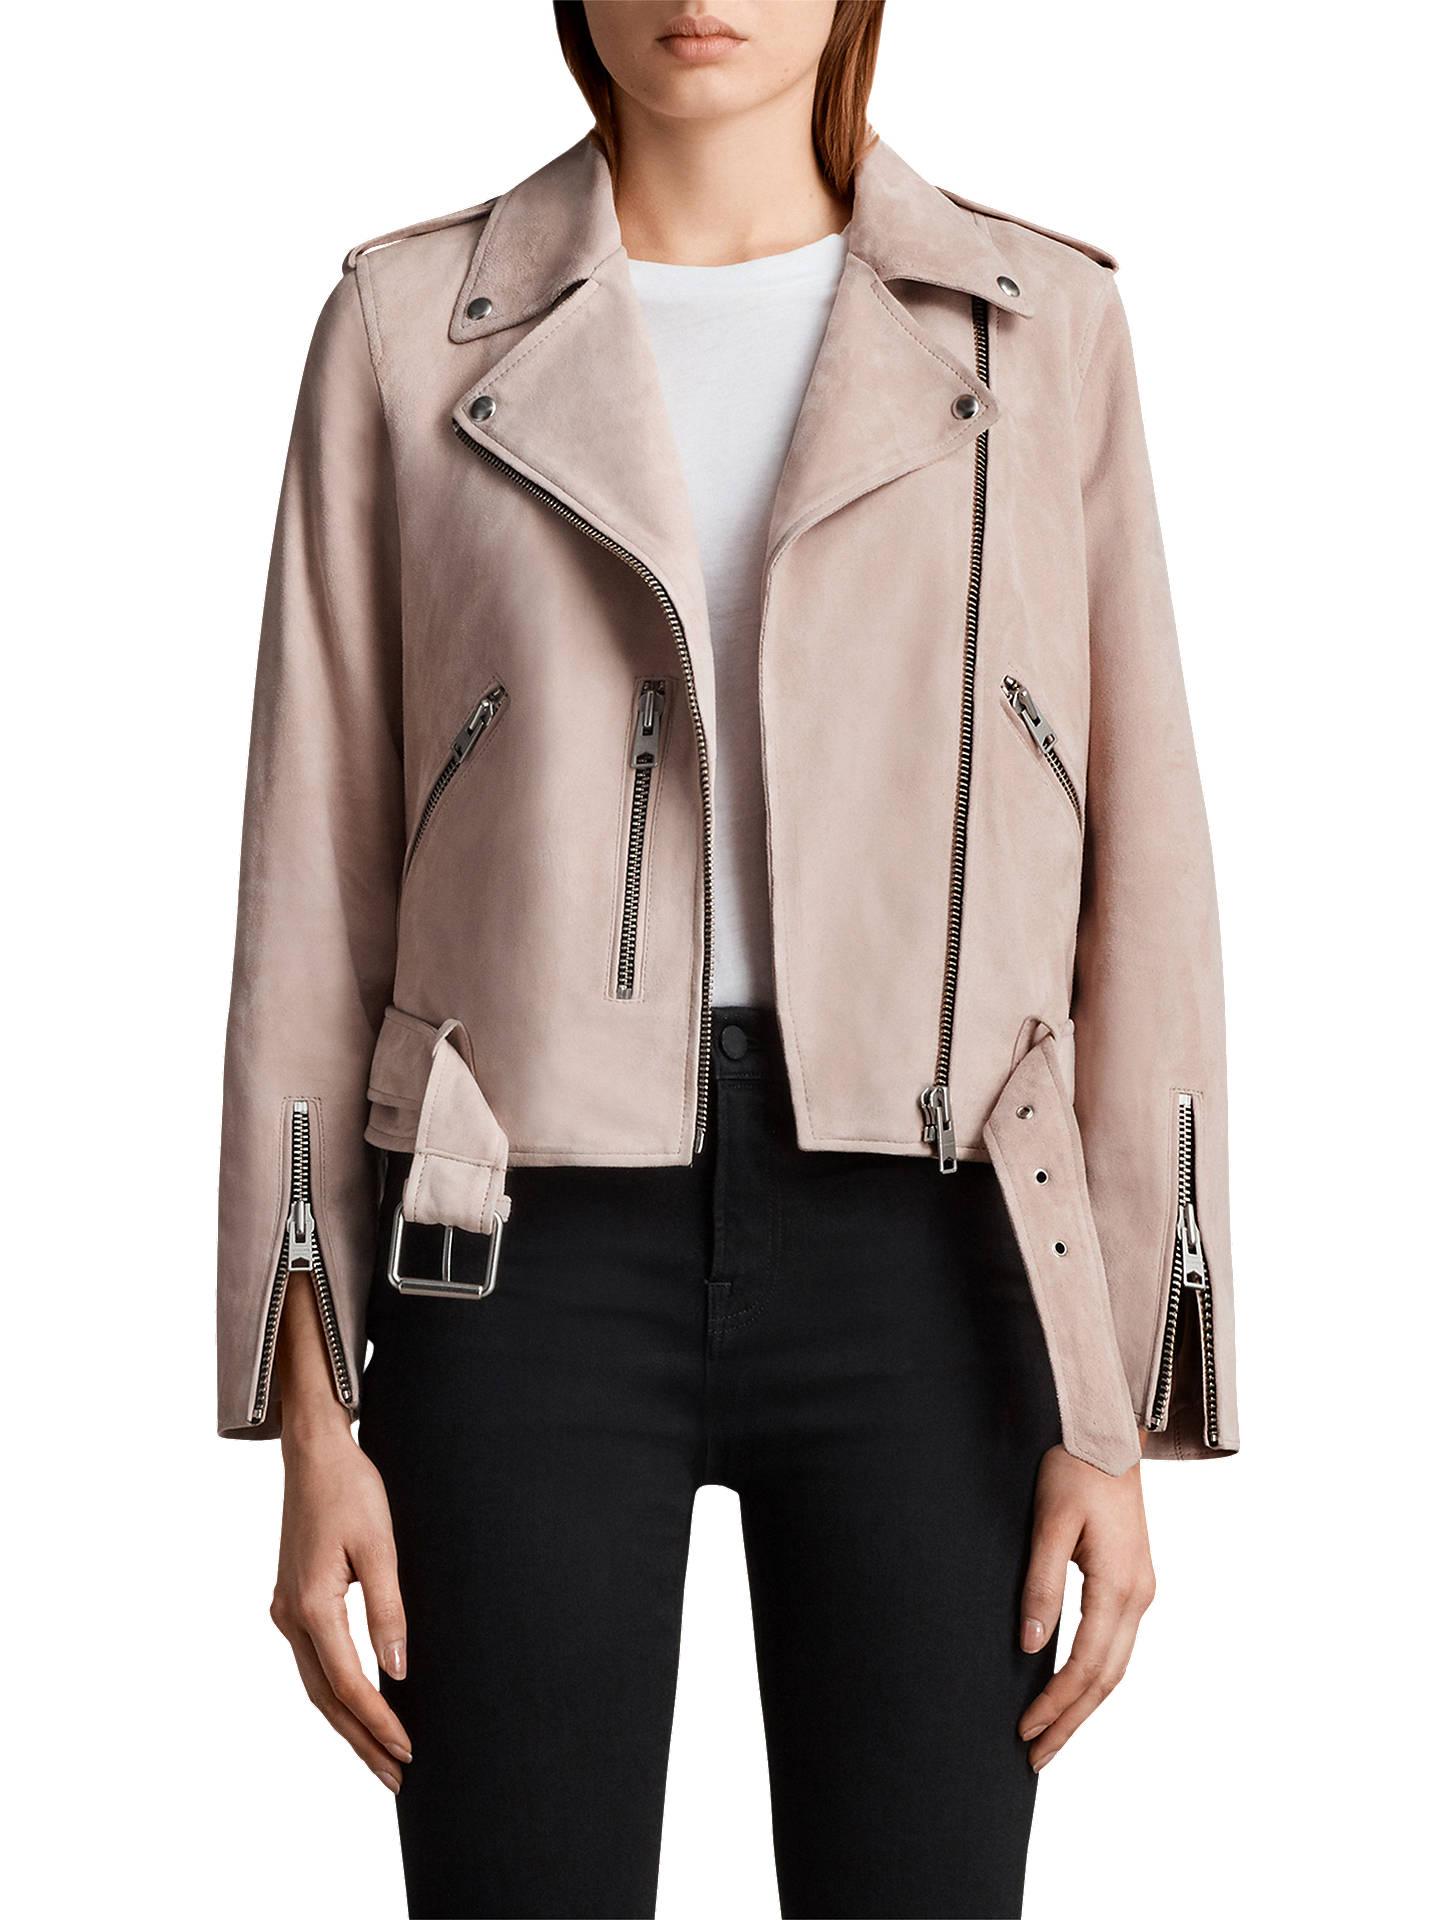 c04f28eb4c4 Buy AllSaints Suede Balfern Biker Jacket, Pale Pink, 6 Online at  johnlewis.com ...